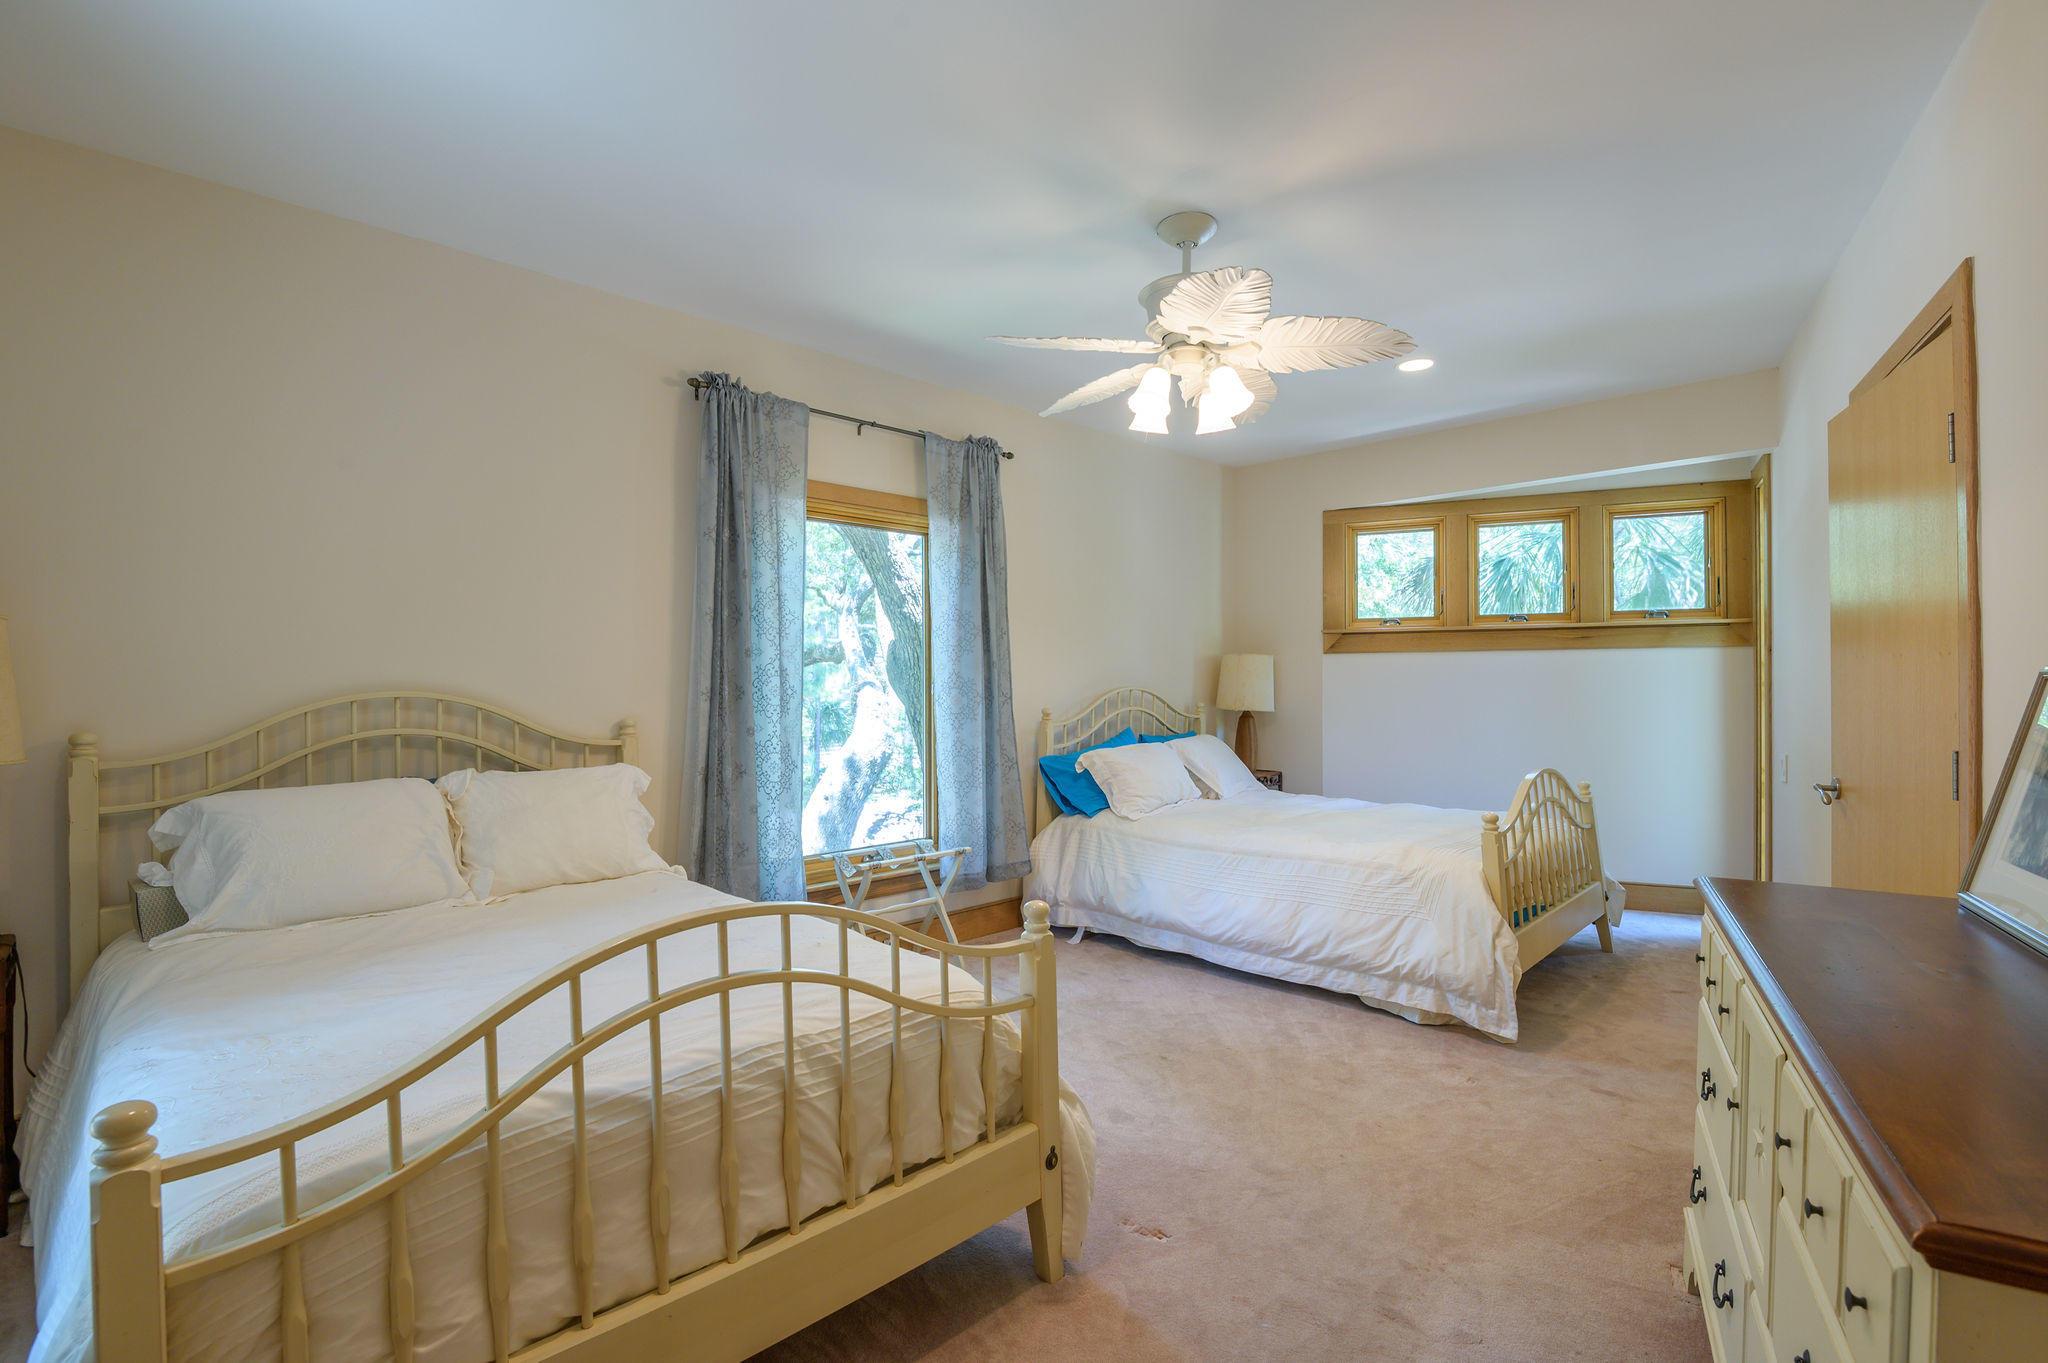 Seabrook Island Homes For Sale - 3087 Marshgate, Seabrook Island, SC - 15